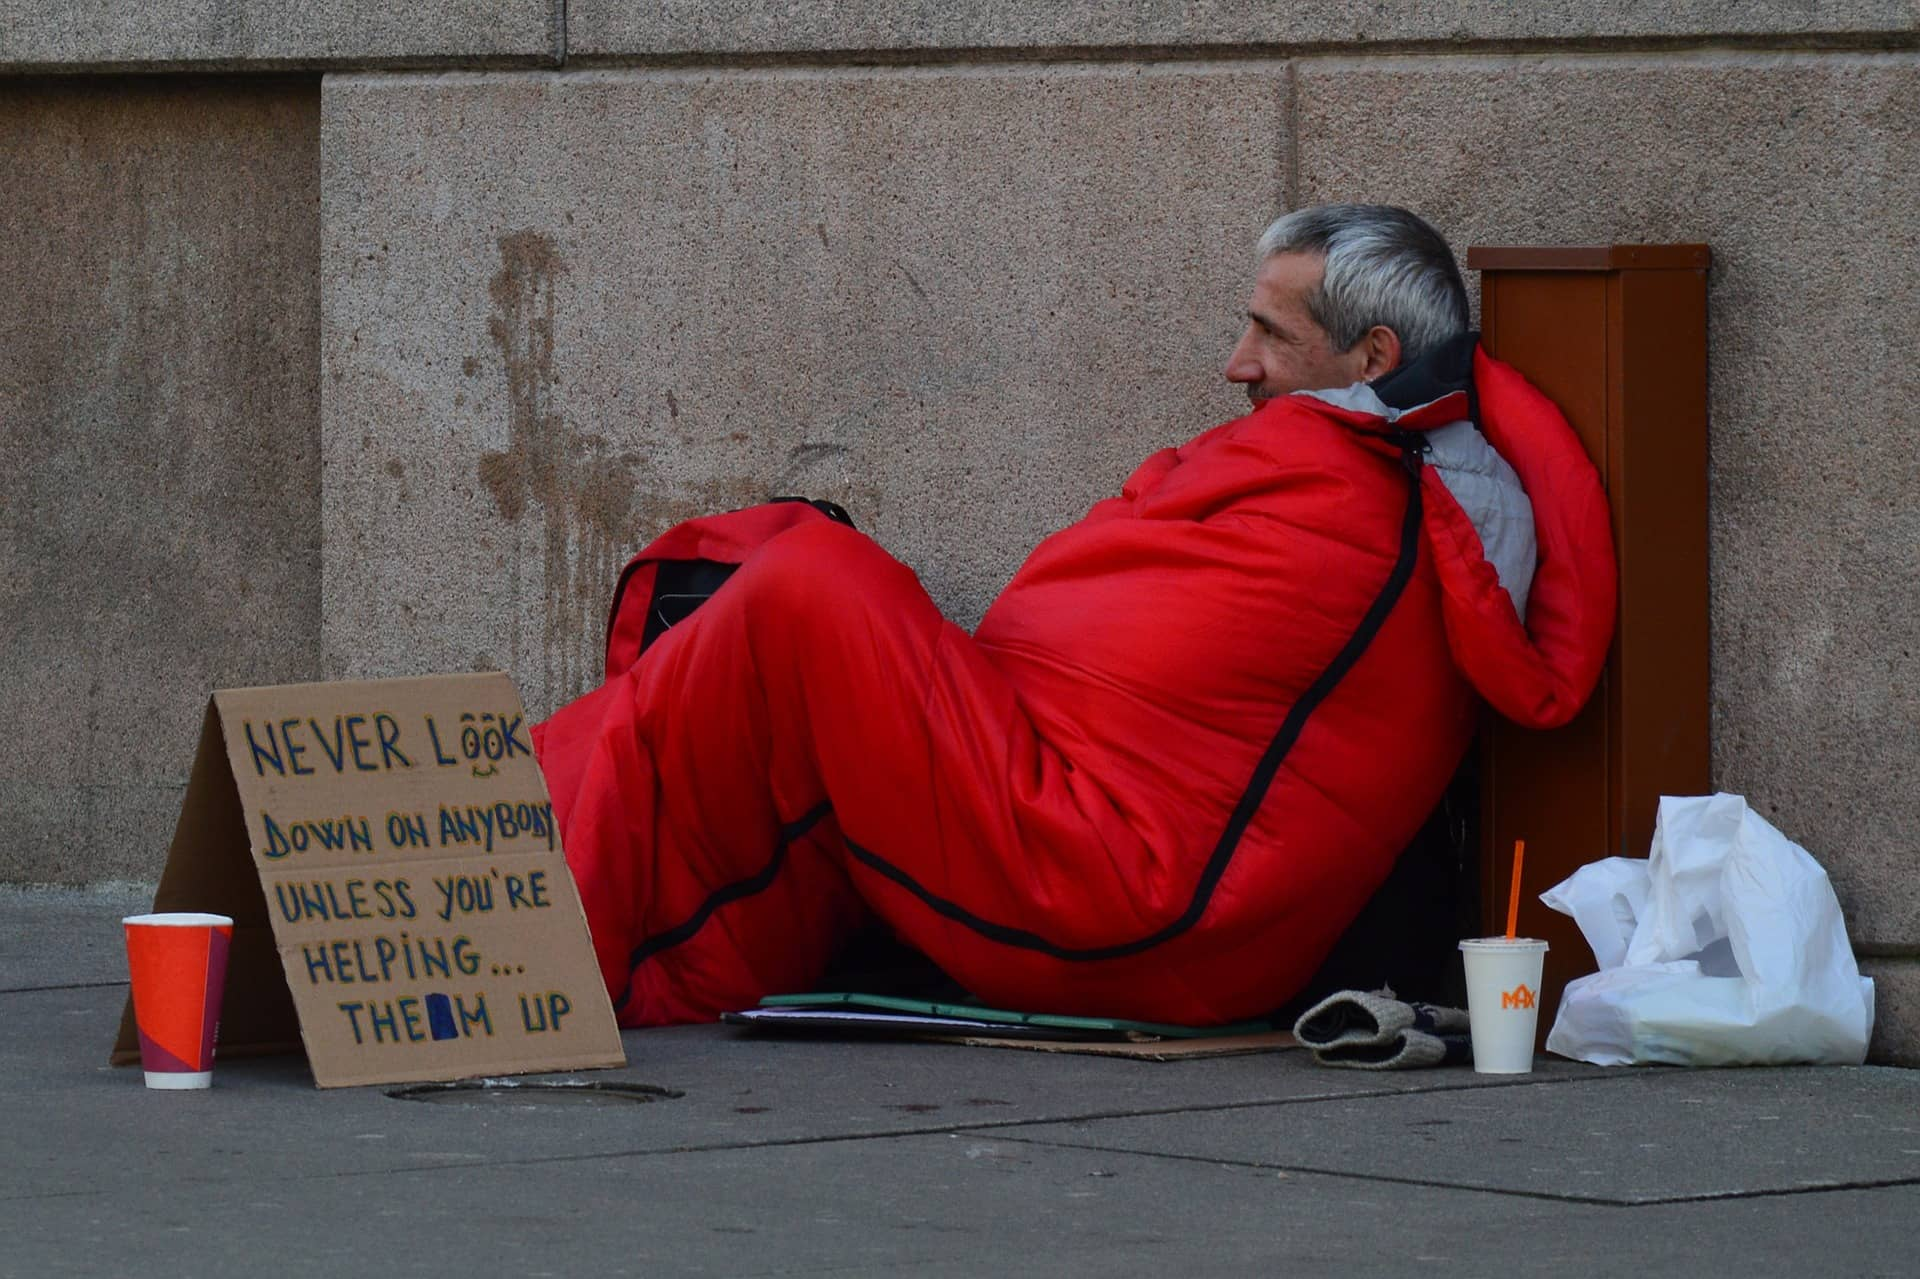 homeless man 833017 1920 1